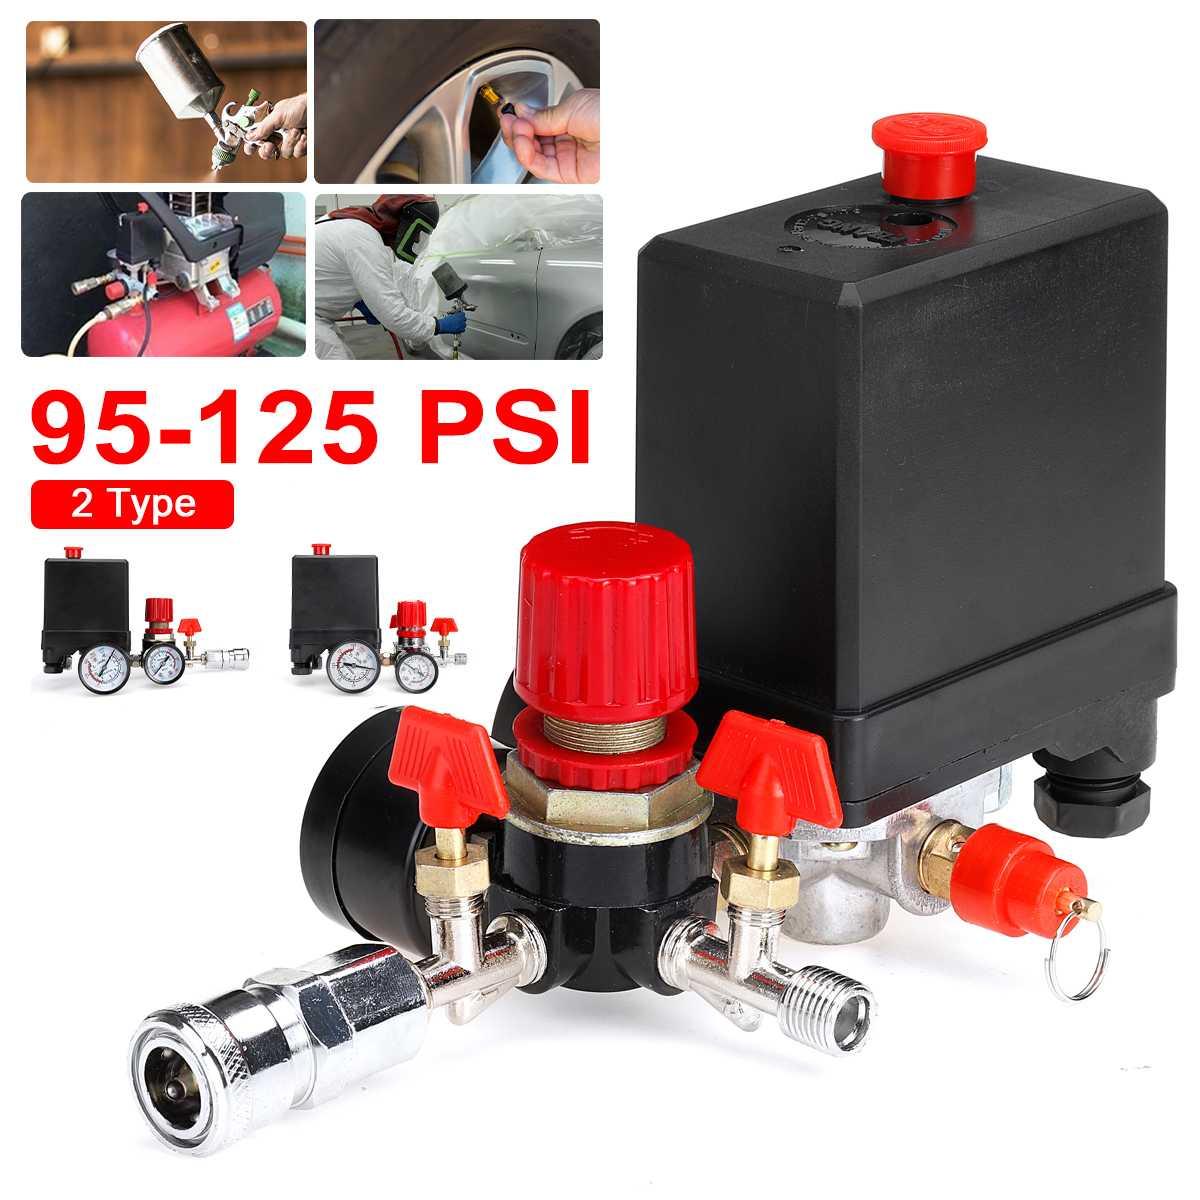 95-125PSI ضاغط الهواء صمام الضغط التبديل المنوع الإغاثة منظم مقاييس الإضاءة الملحقات مفاتيح مع مقياس